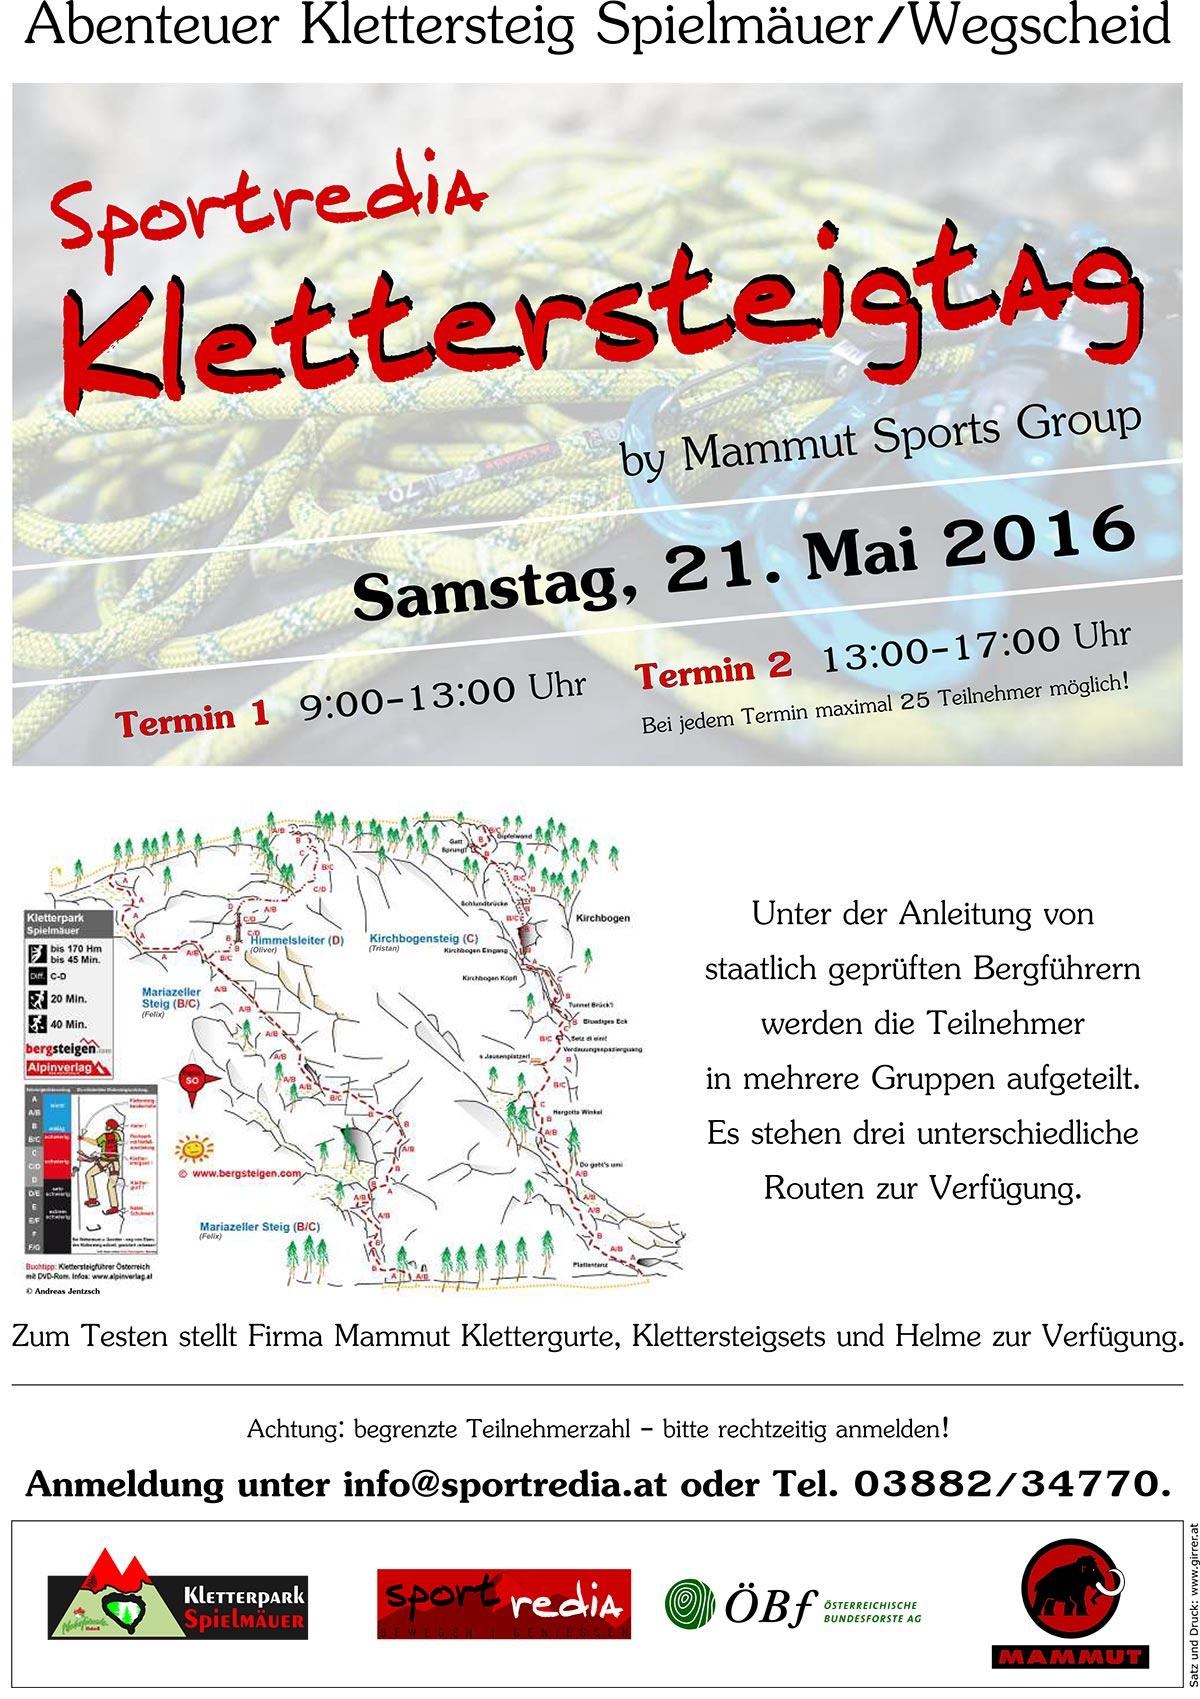 klettersteig-event-plakat